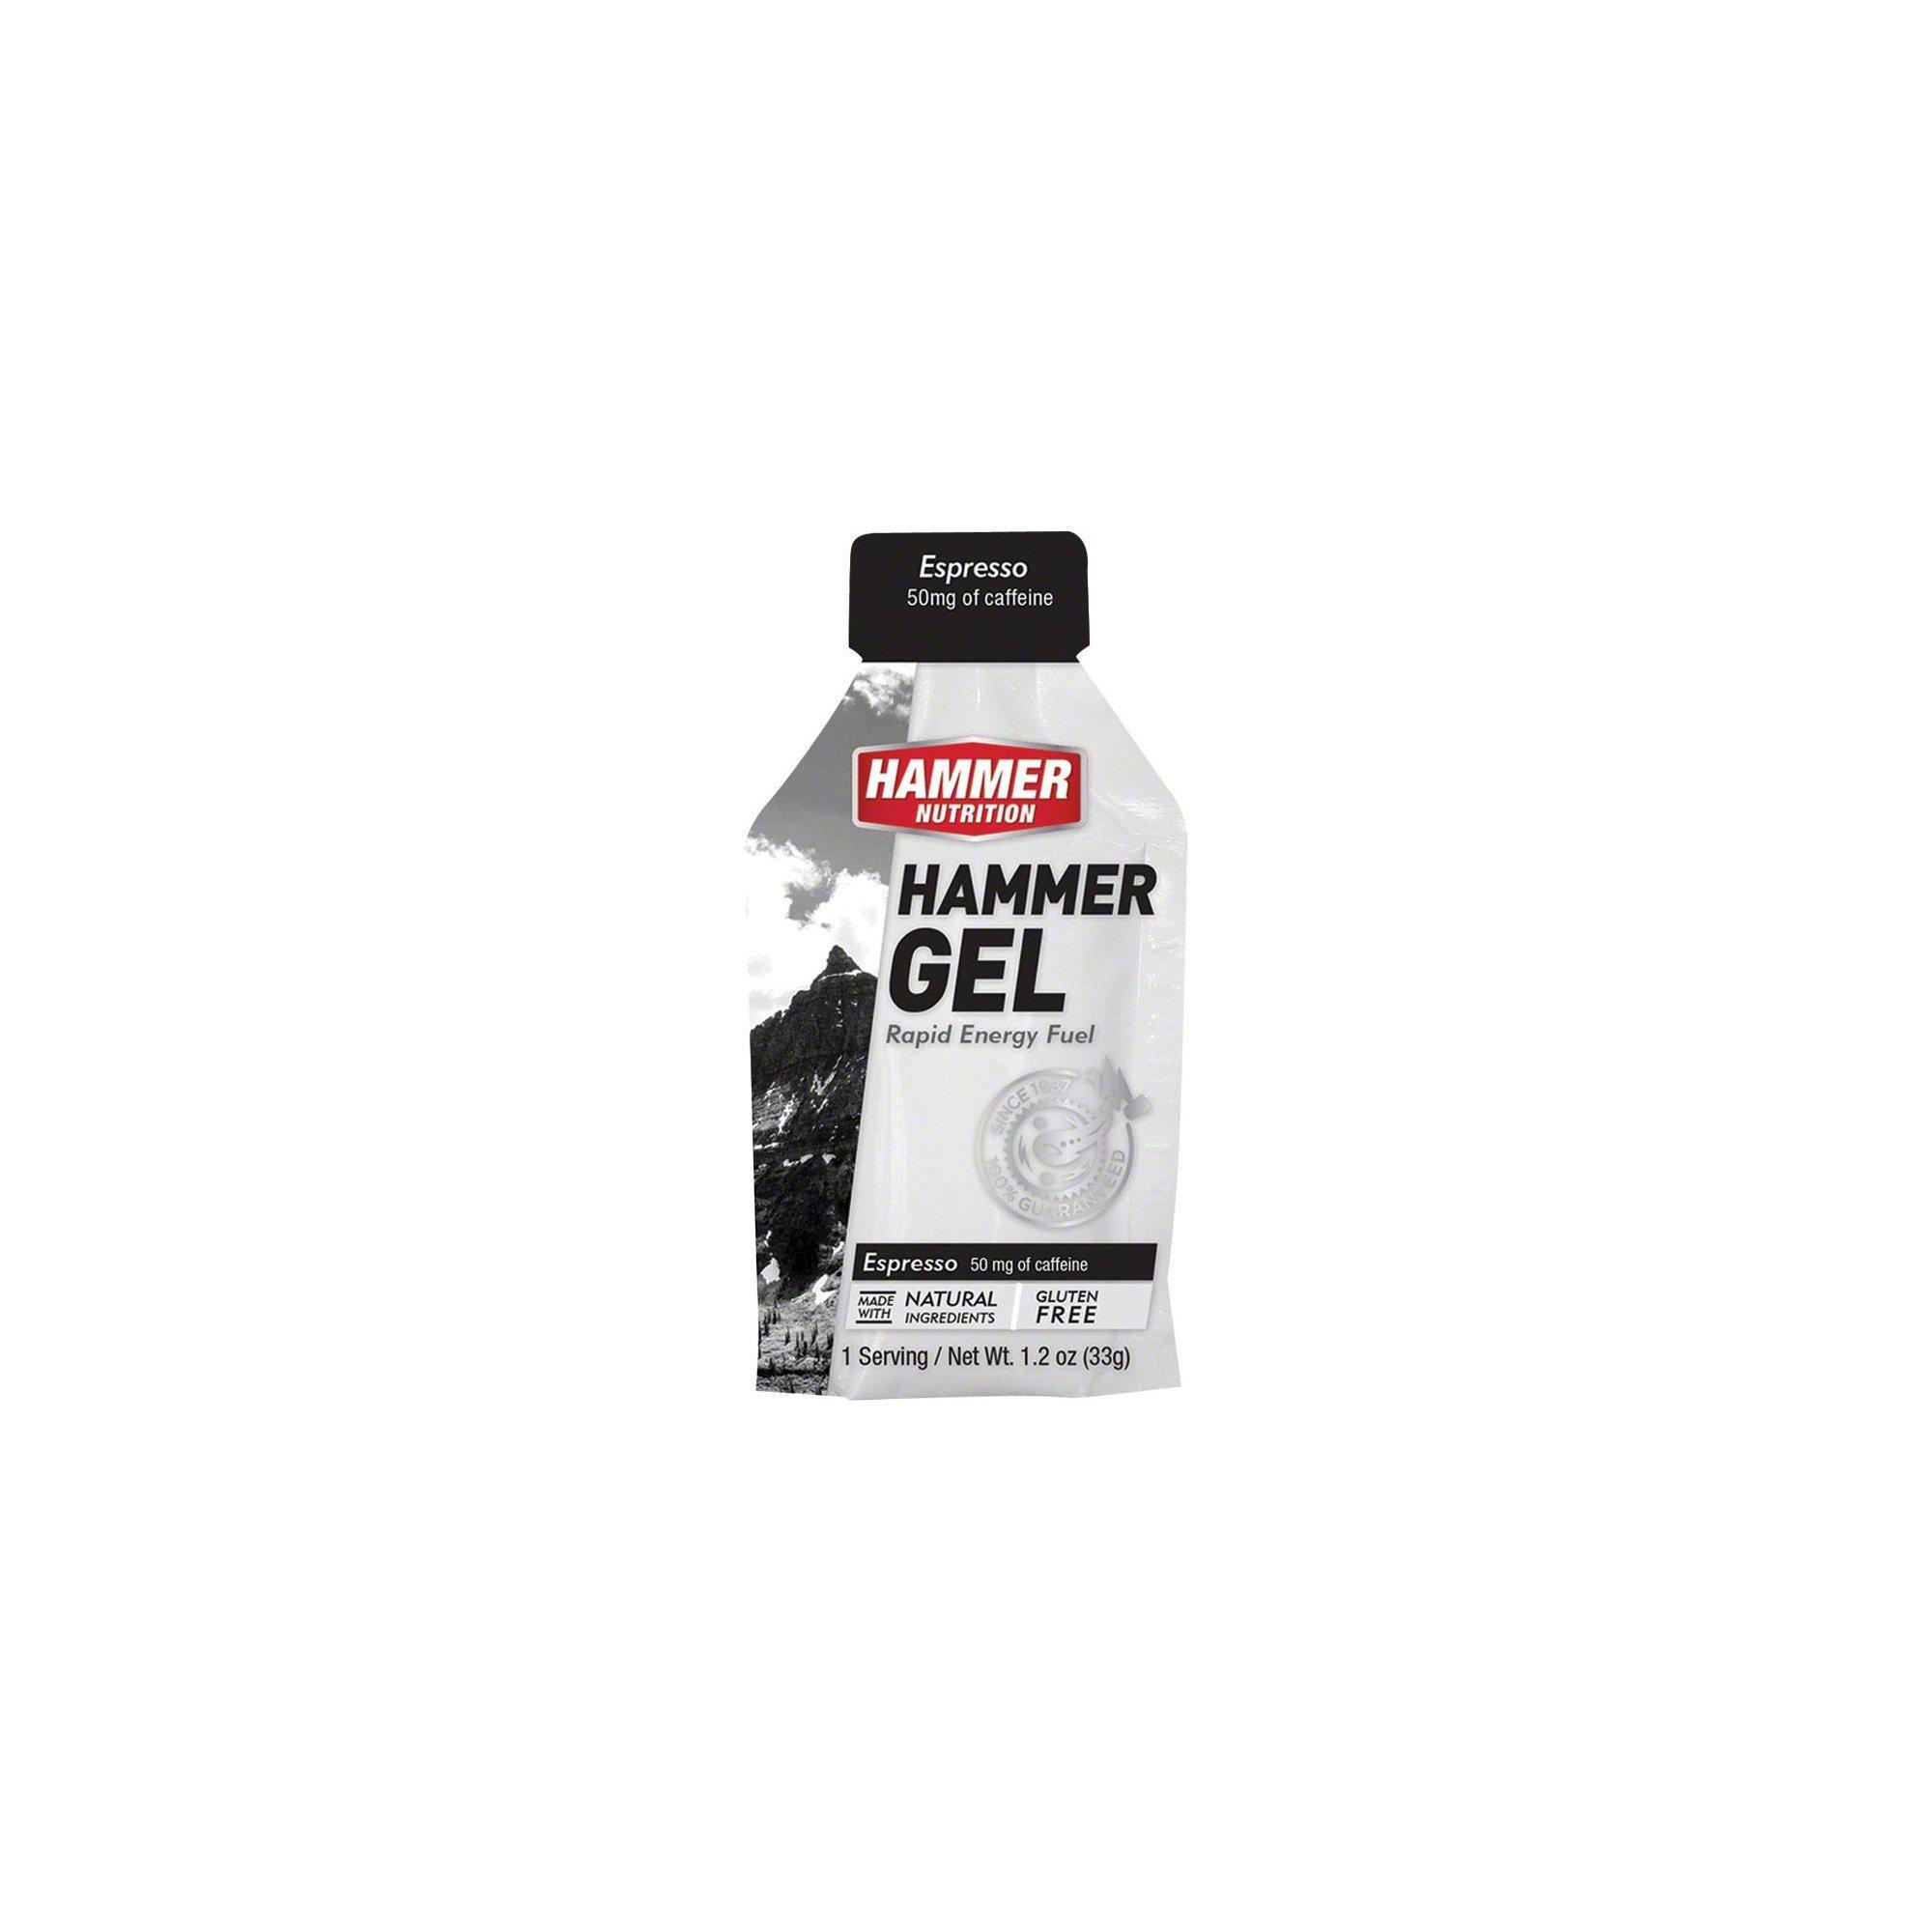 Hammer Nutrition Hammer Gel 24 pack, Espresso